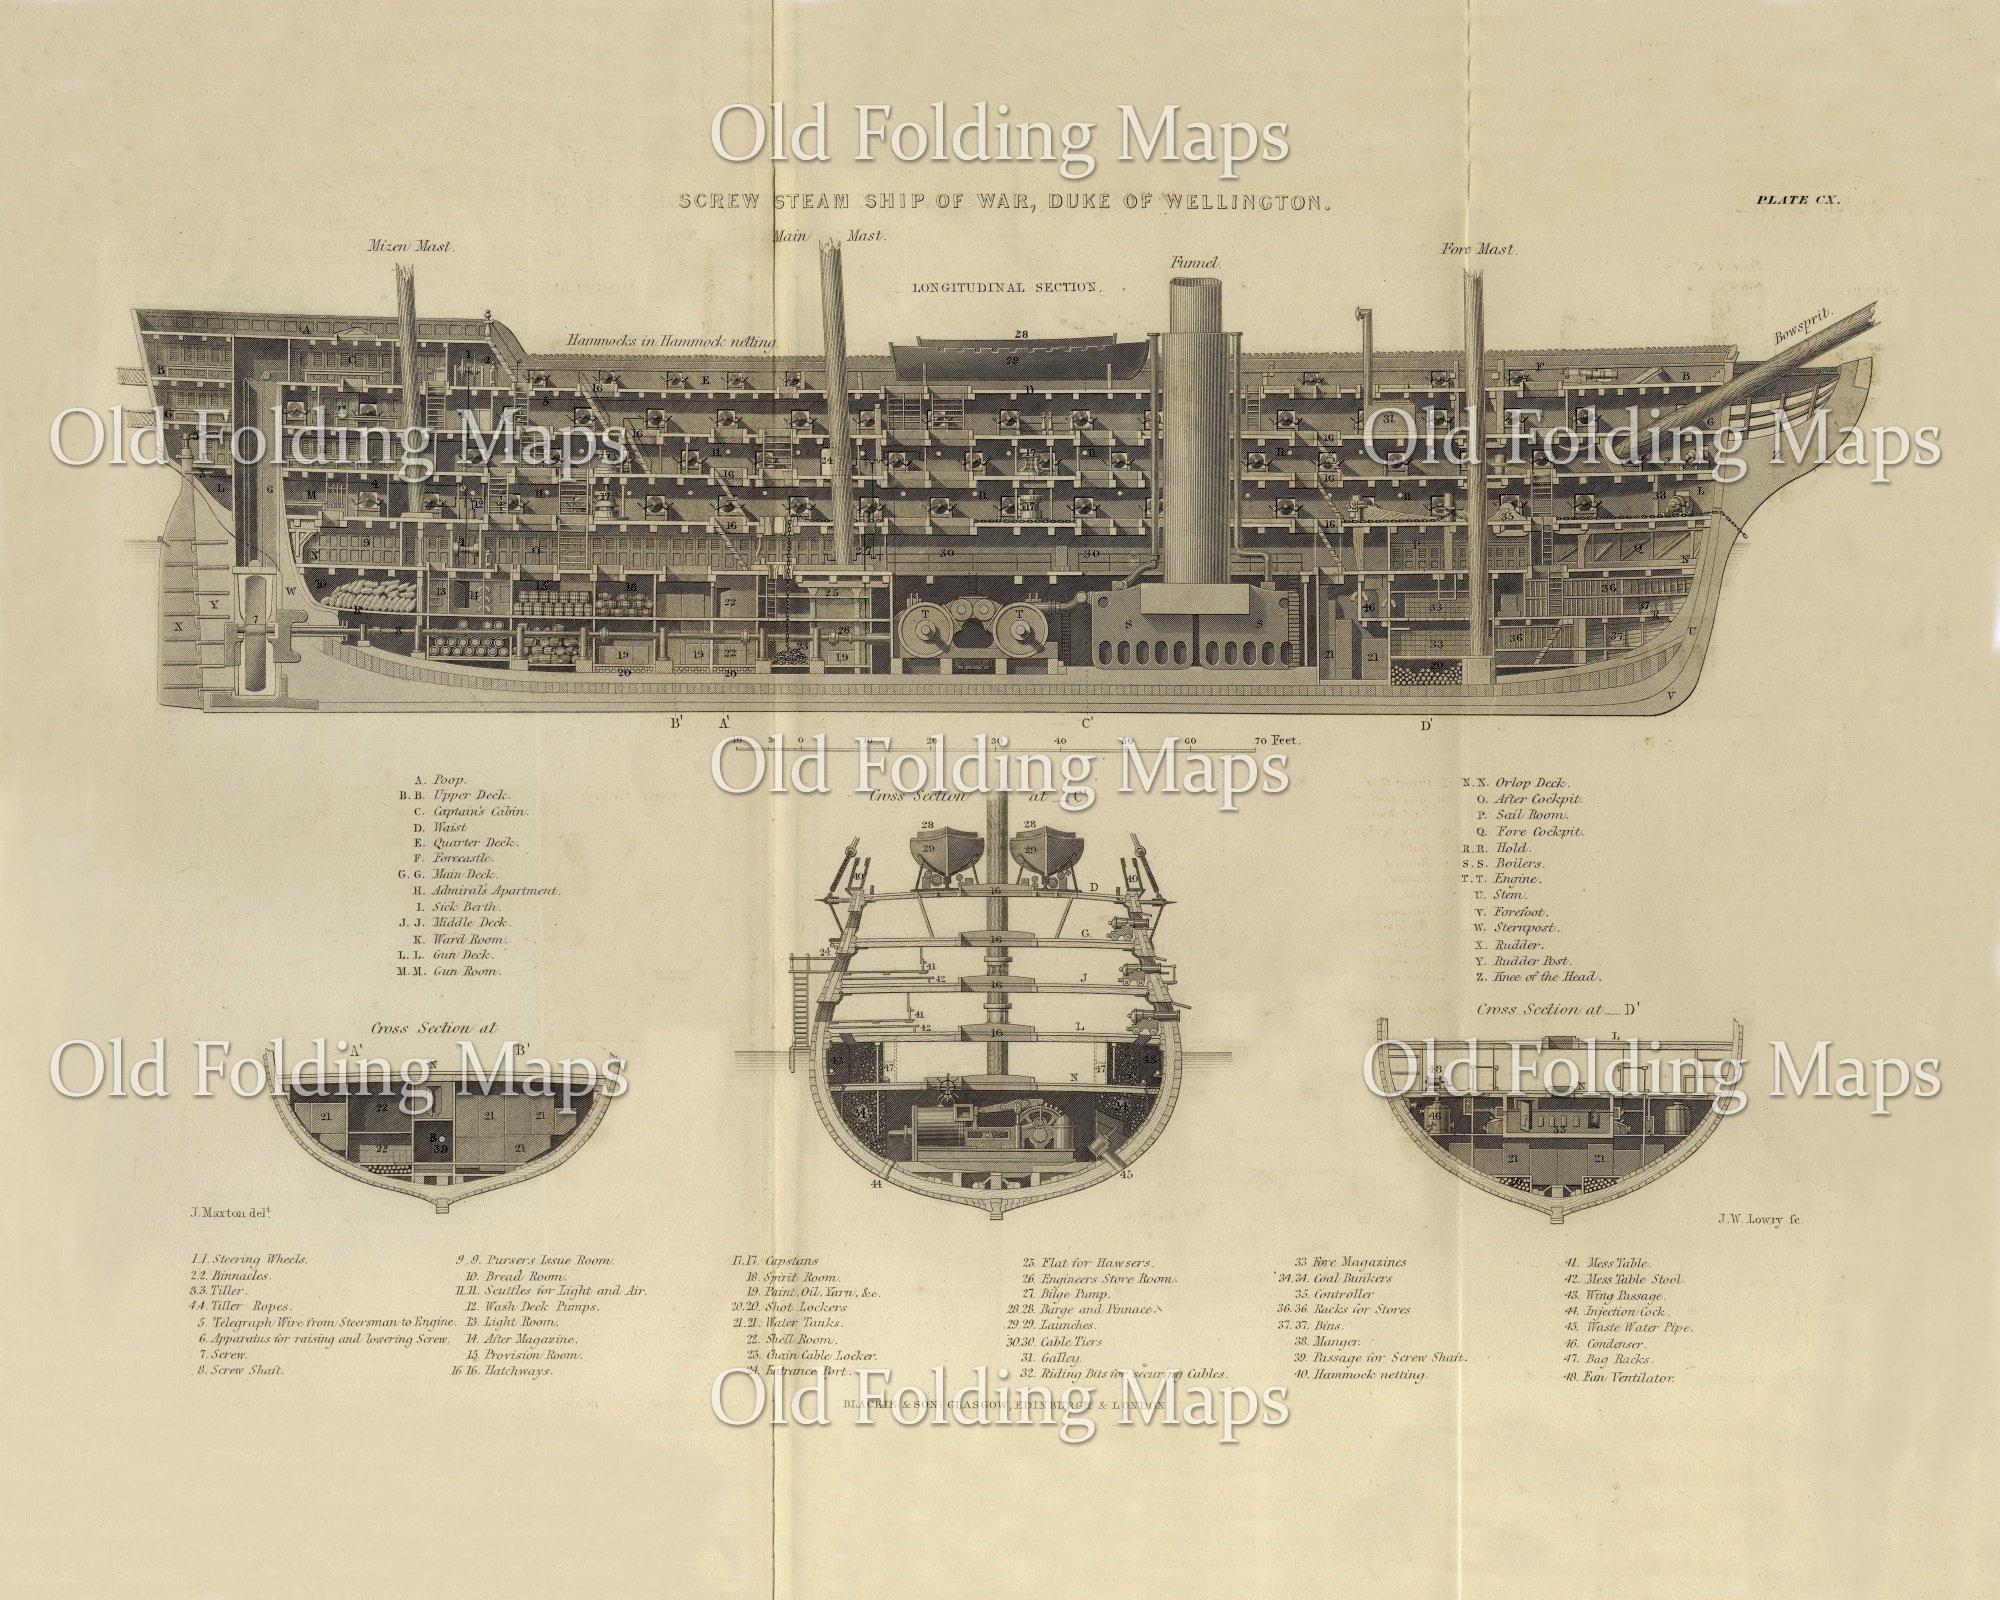 Antique Illustration of Steam Ship of War - Duke of Wellington on